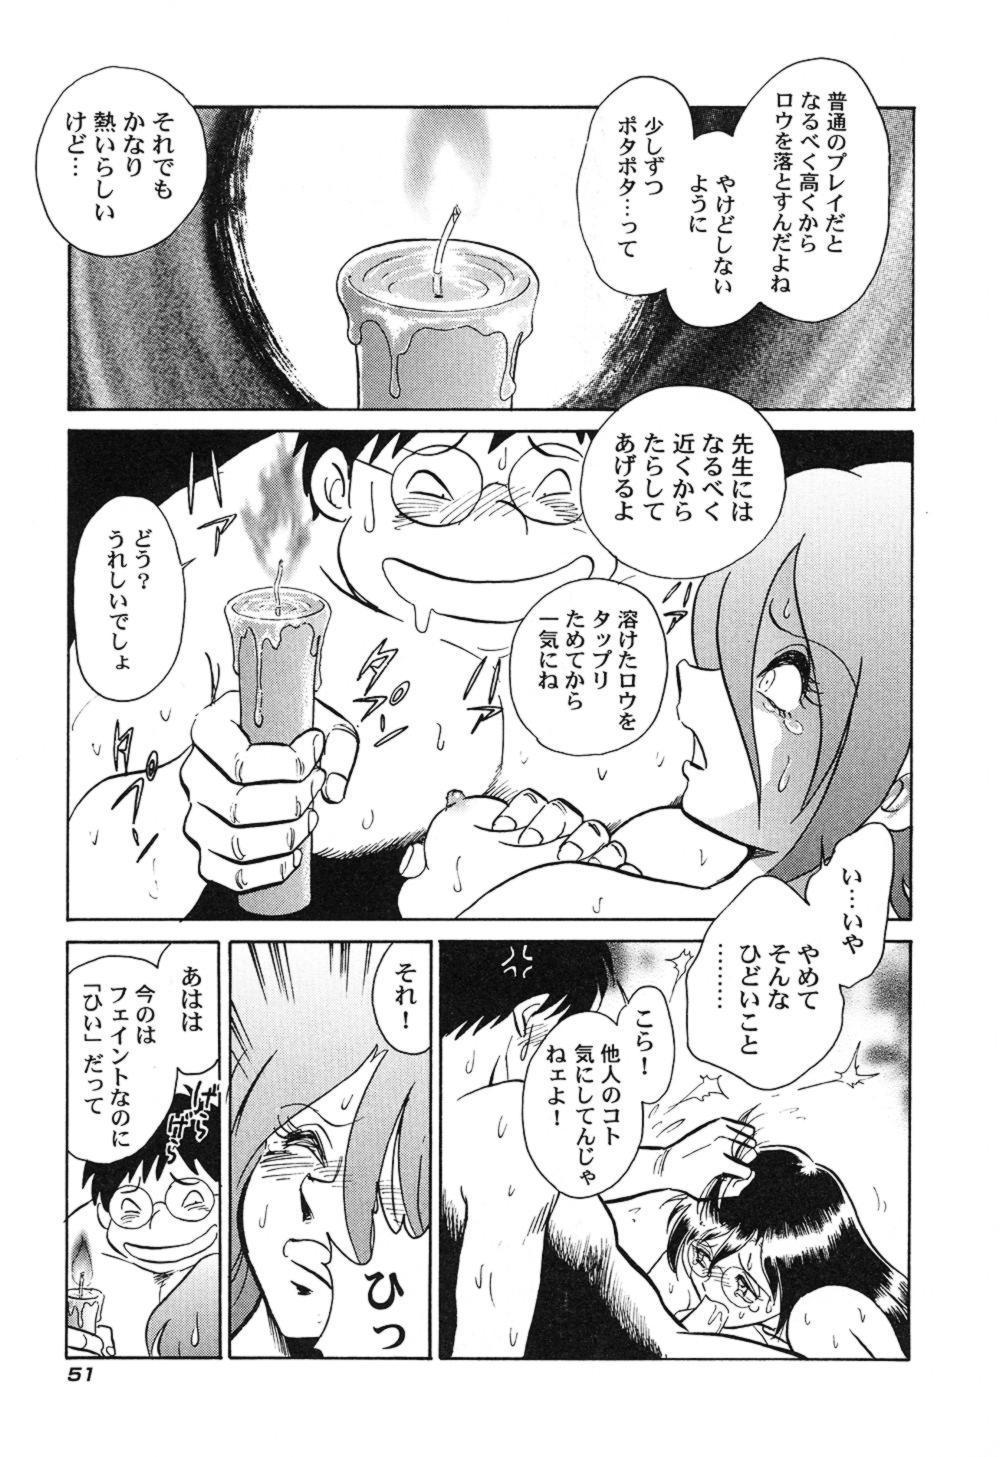 Hageshii Kagai Jugyou 53